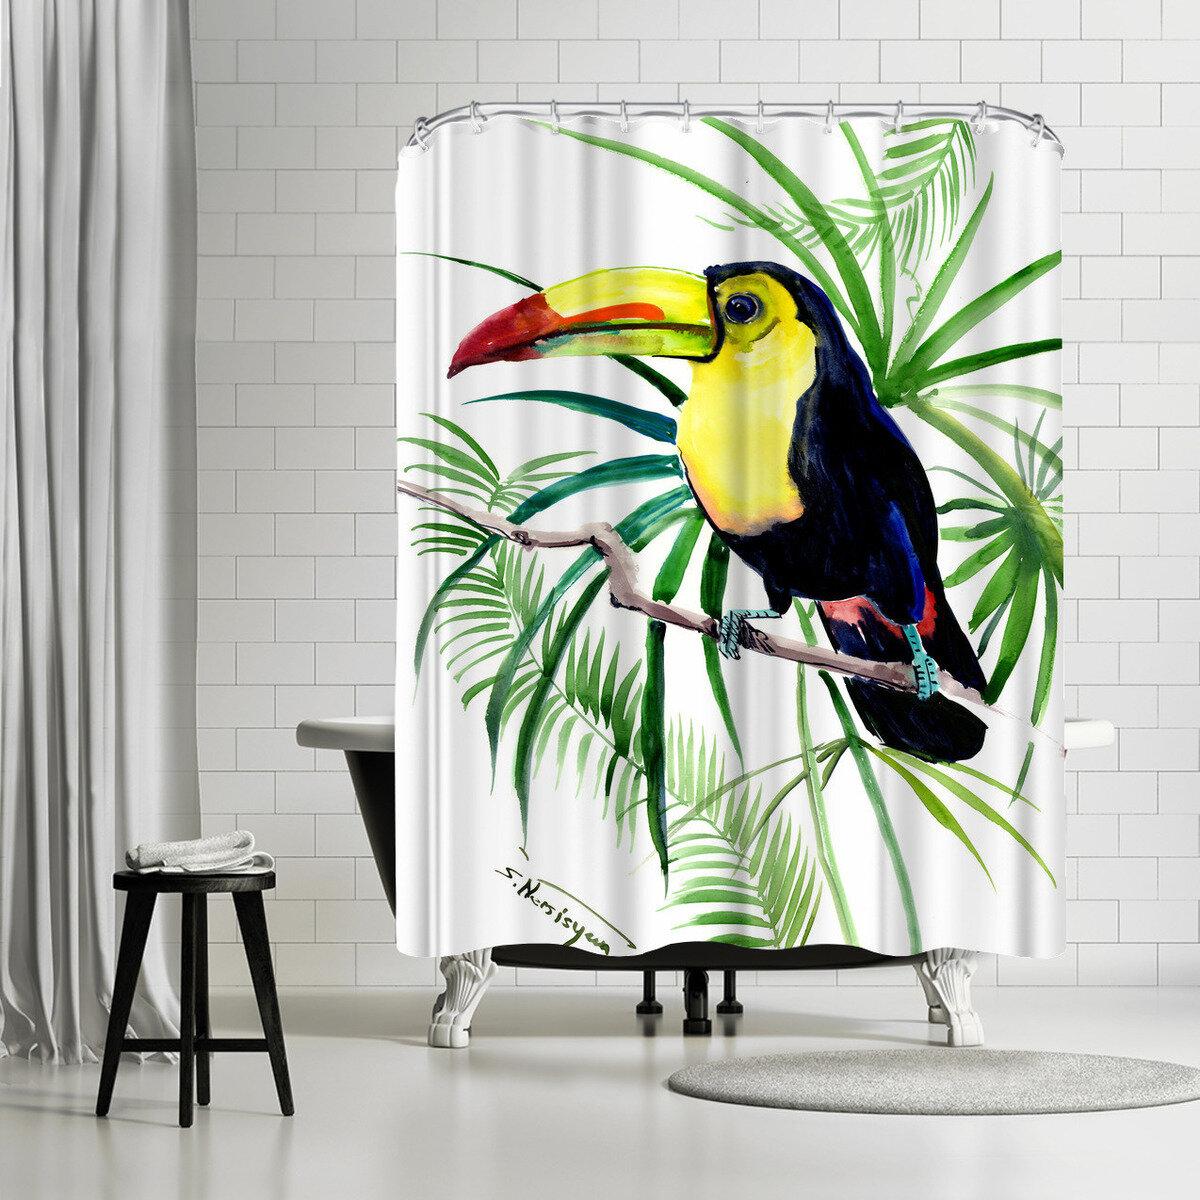 East Urban Home Suren Nersisyan Tropical Toucan Single Shower Curtain Wayfair